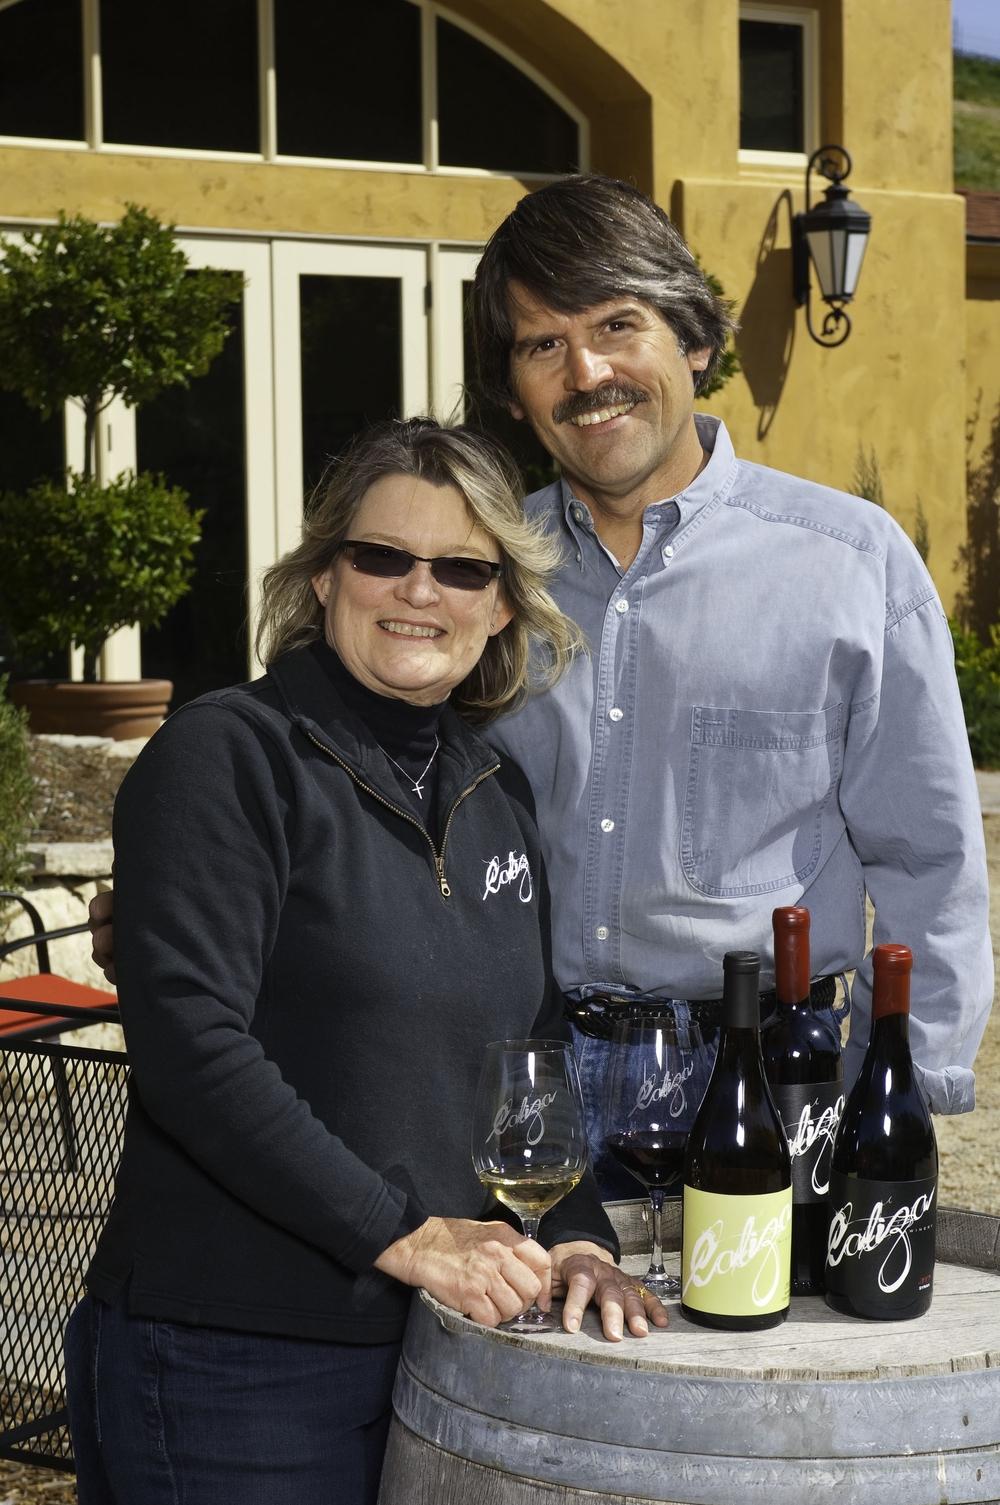 Great photo here of Caliza proprietors, Pam and Carl Bowker